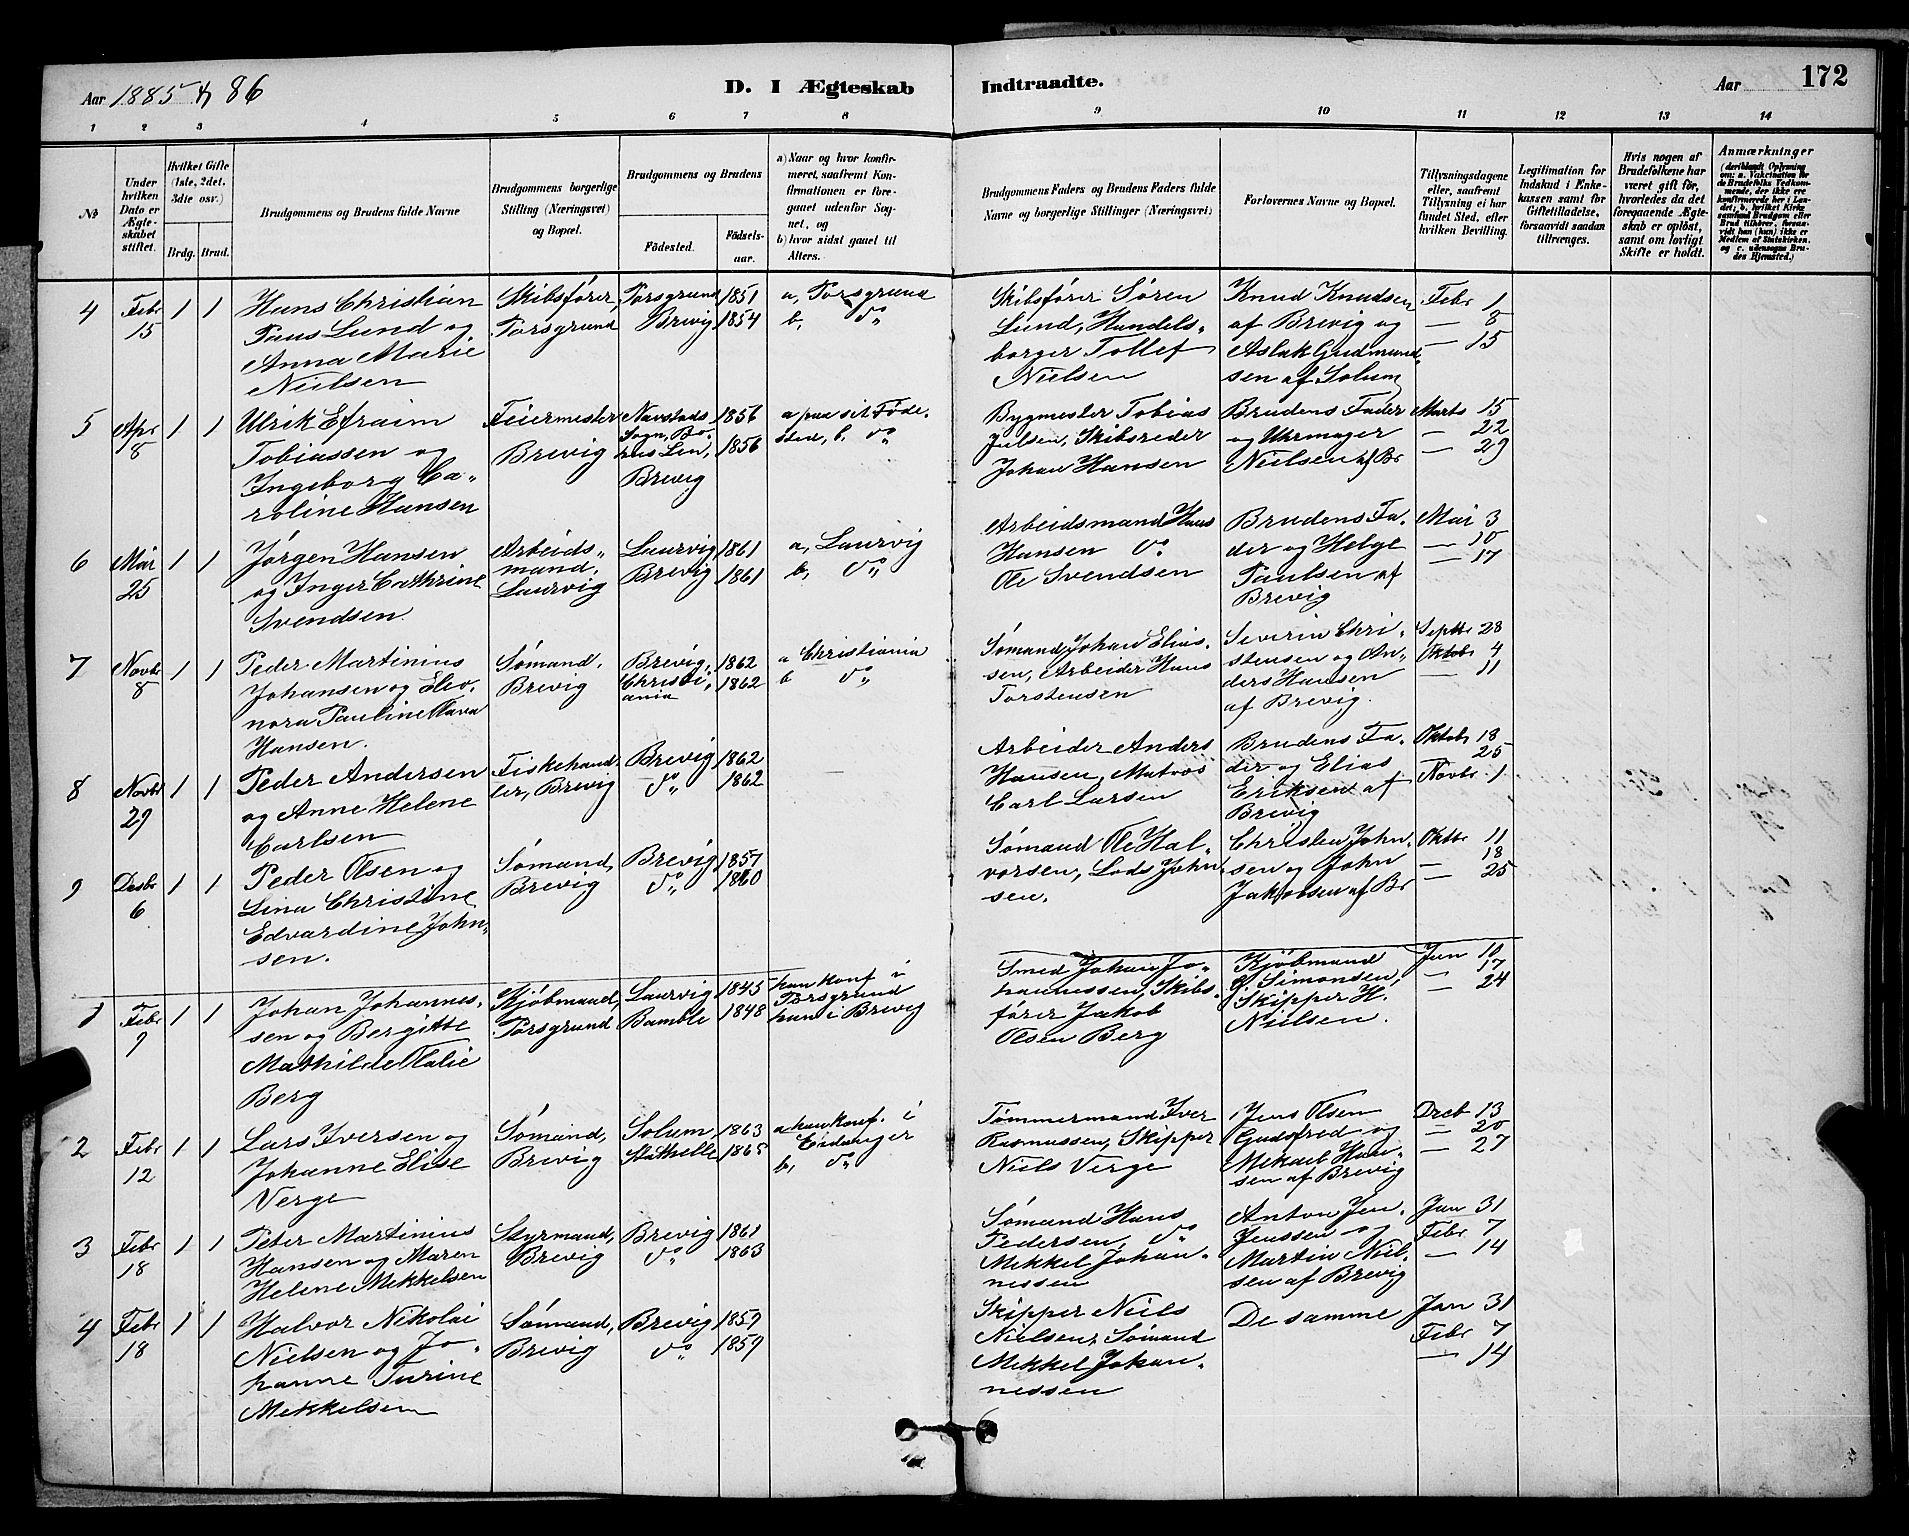 SAKO, Brevik kirkebøker, G/Ga/L0004: Klokkerbok nr. 4, 1882-1900, s. 172